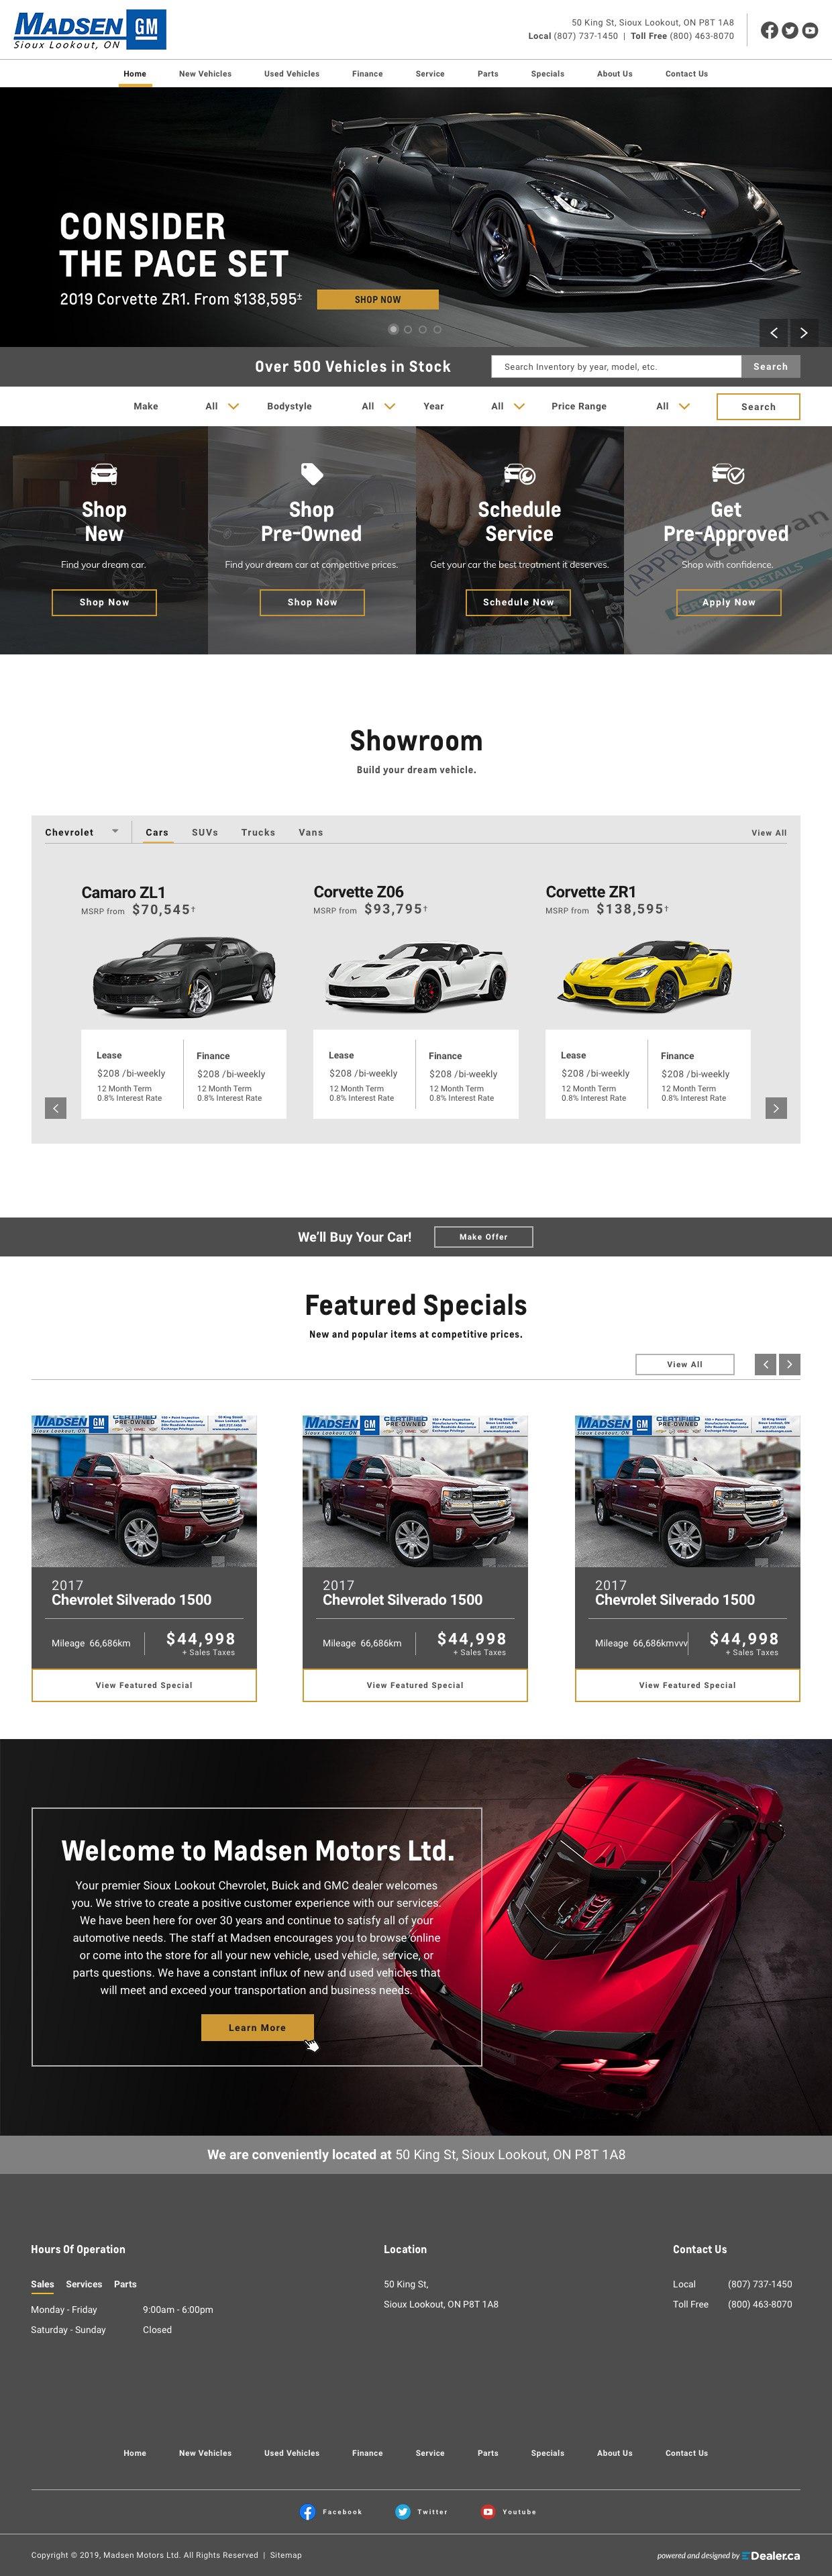 Madsen Motors Ltd